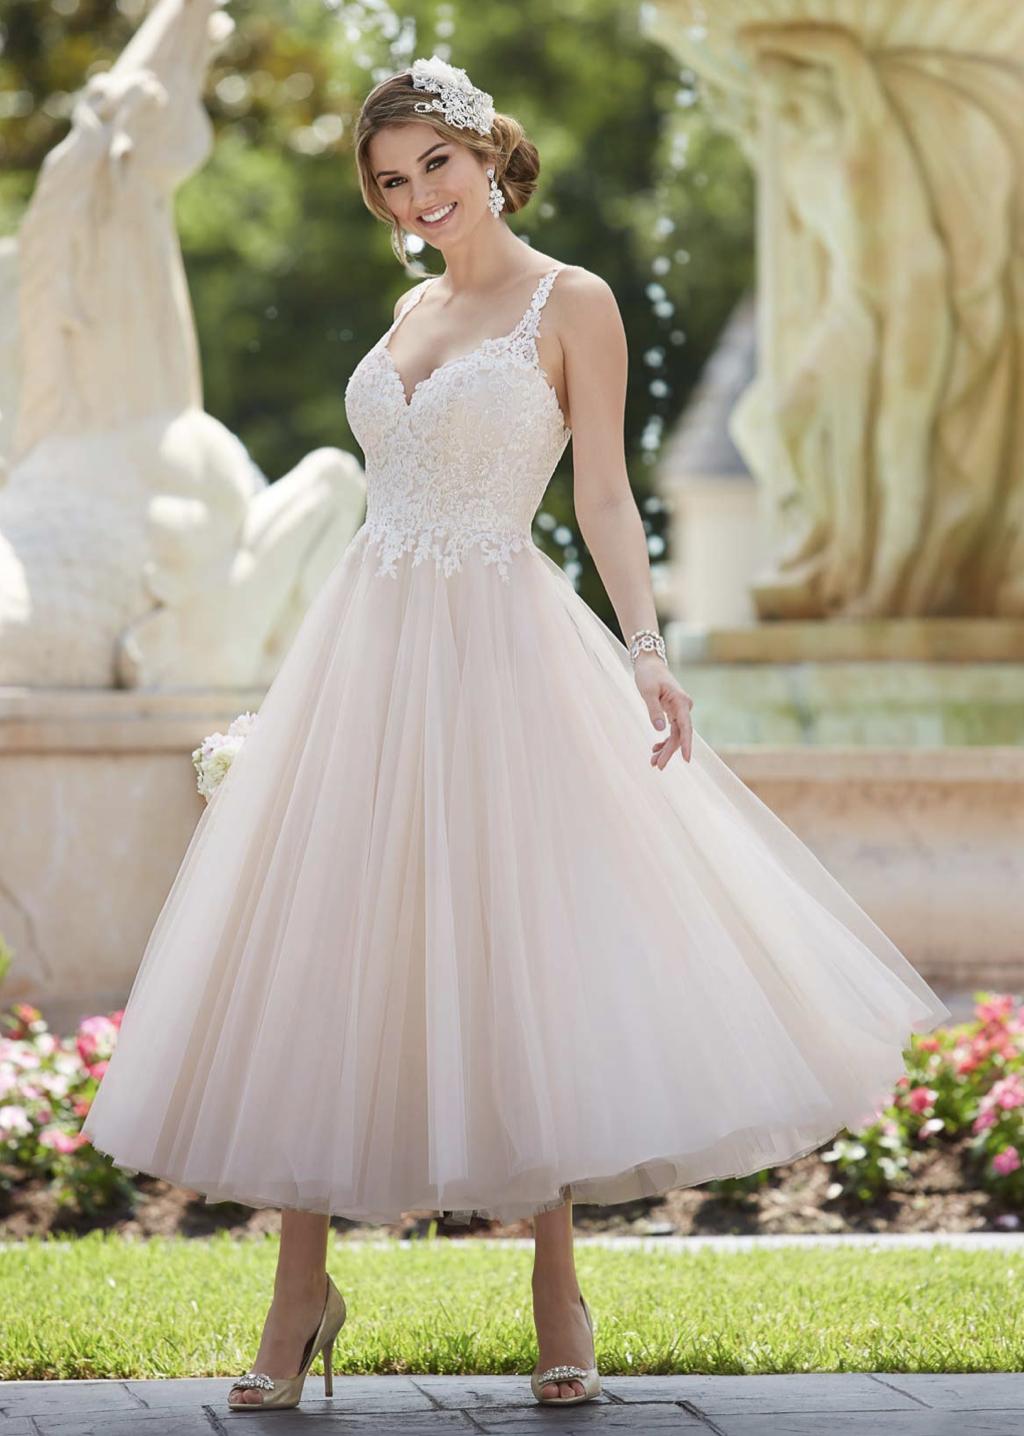 tea-length dress with tulle skirt from Essense of Australia